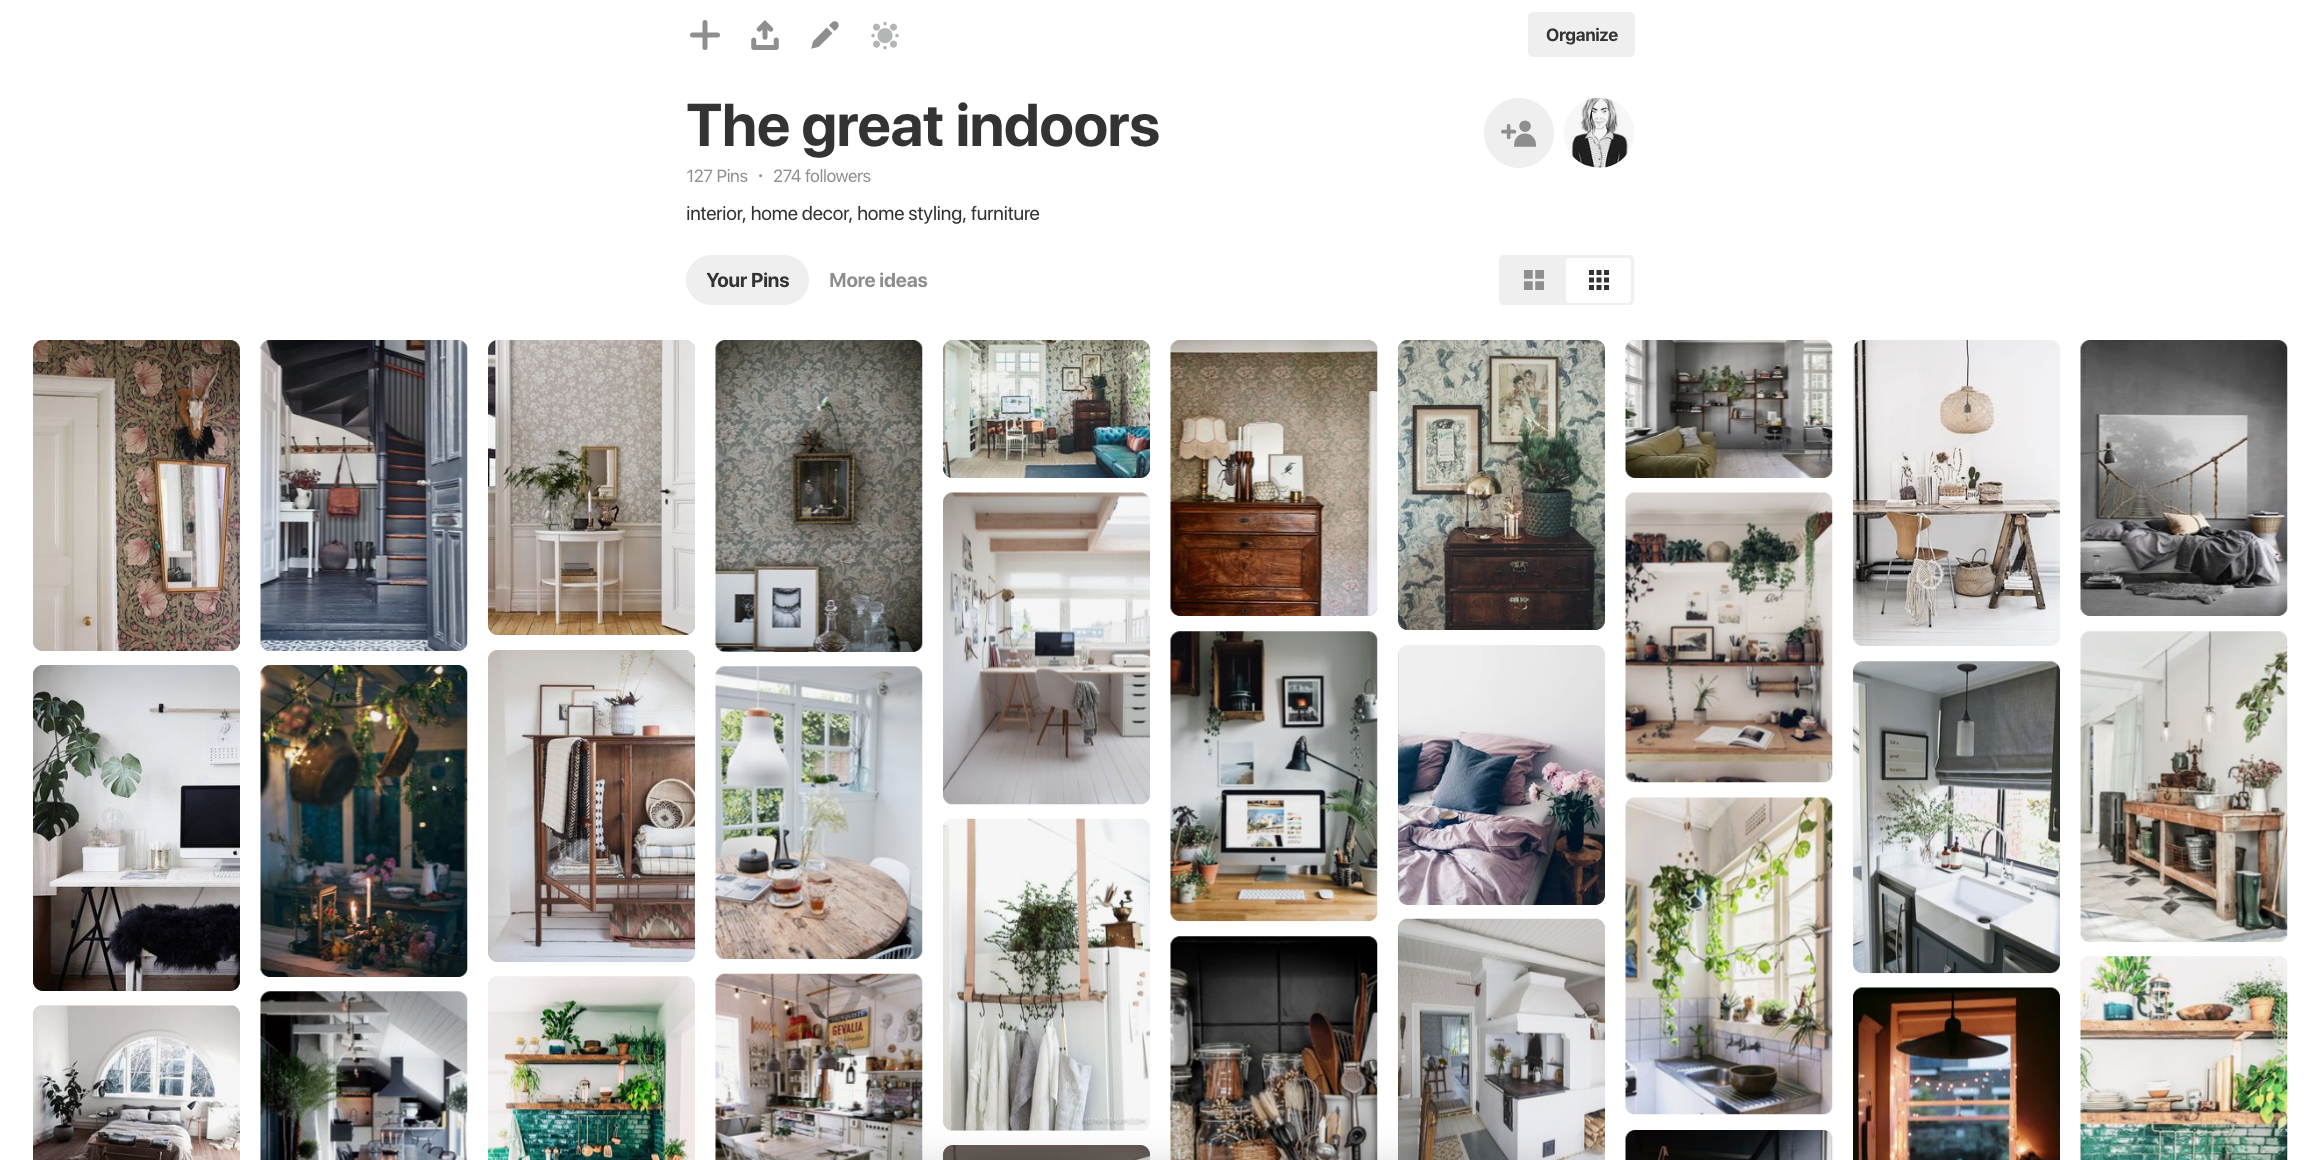 Inredningsinspiration på Pinterest